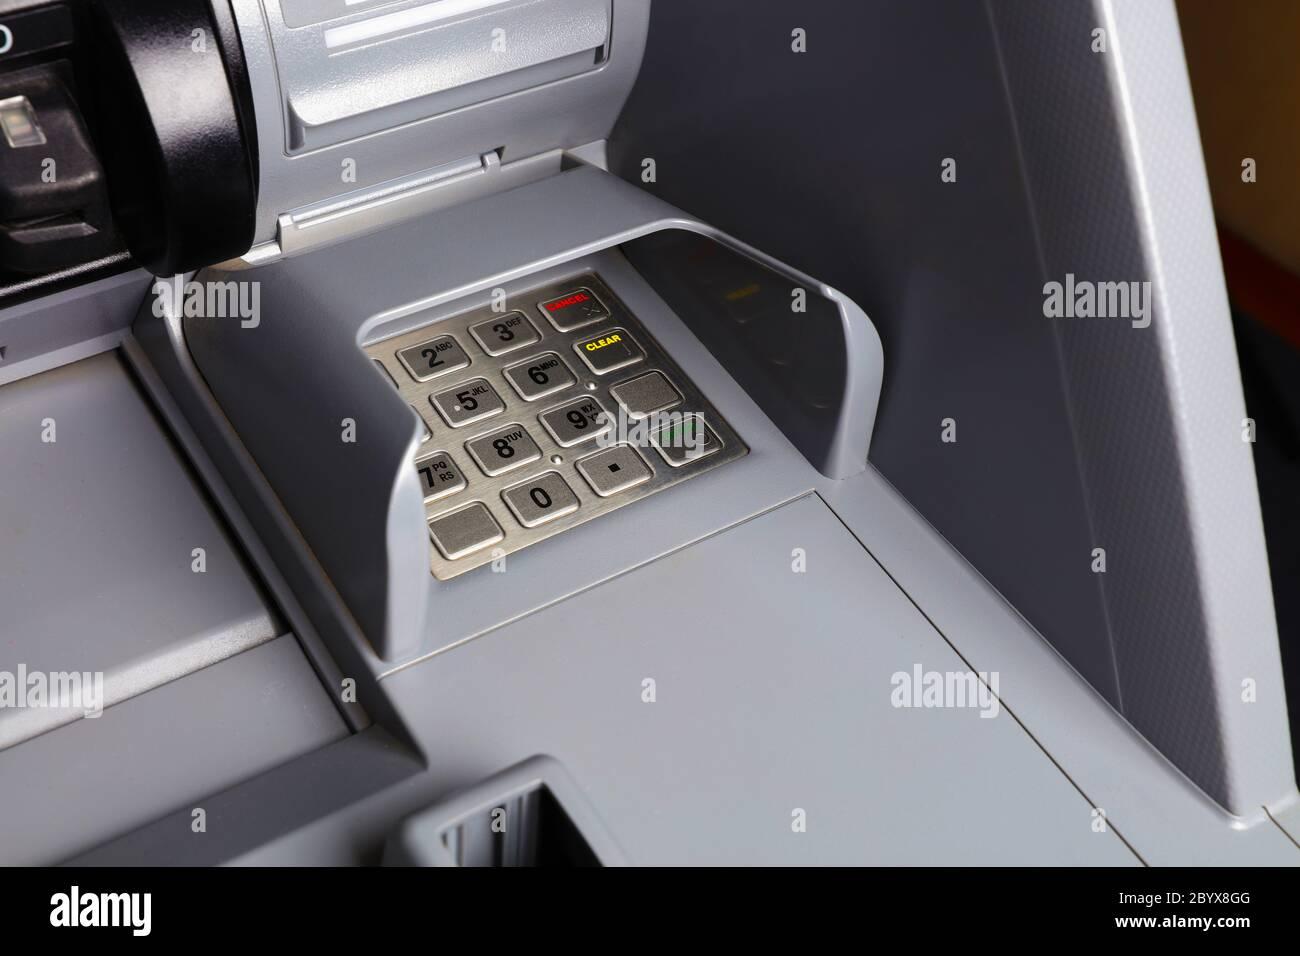 Automated payout machines betting terminals at jfk guadagnare con bitcoins mining